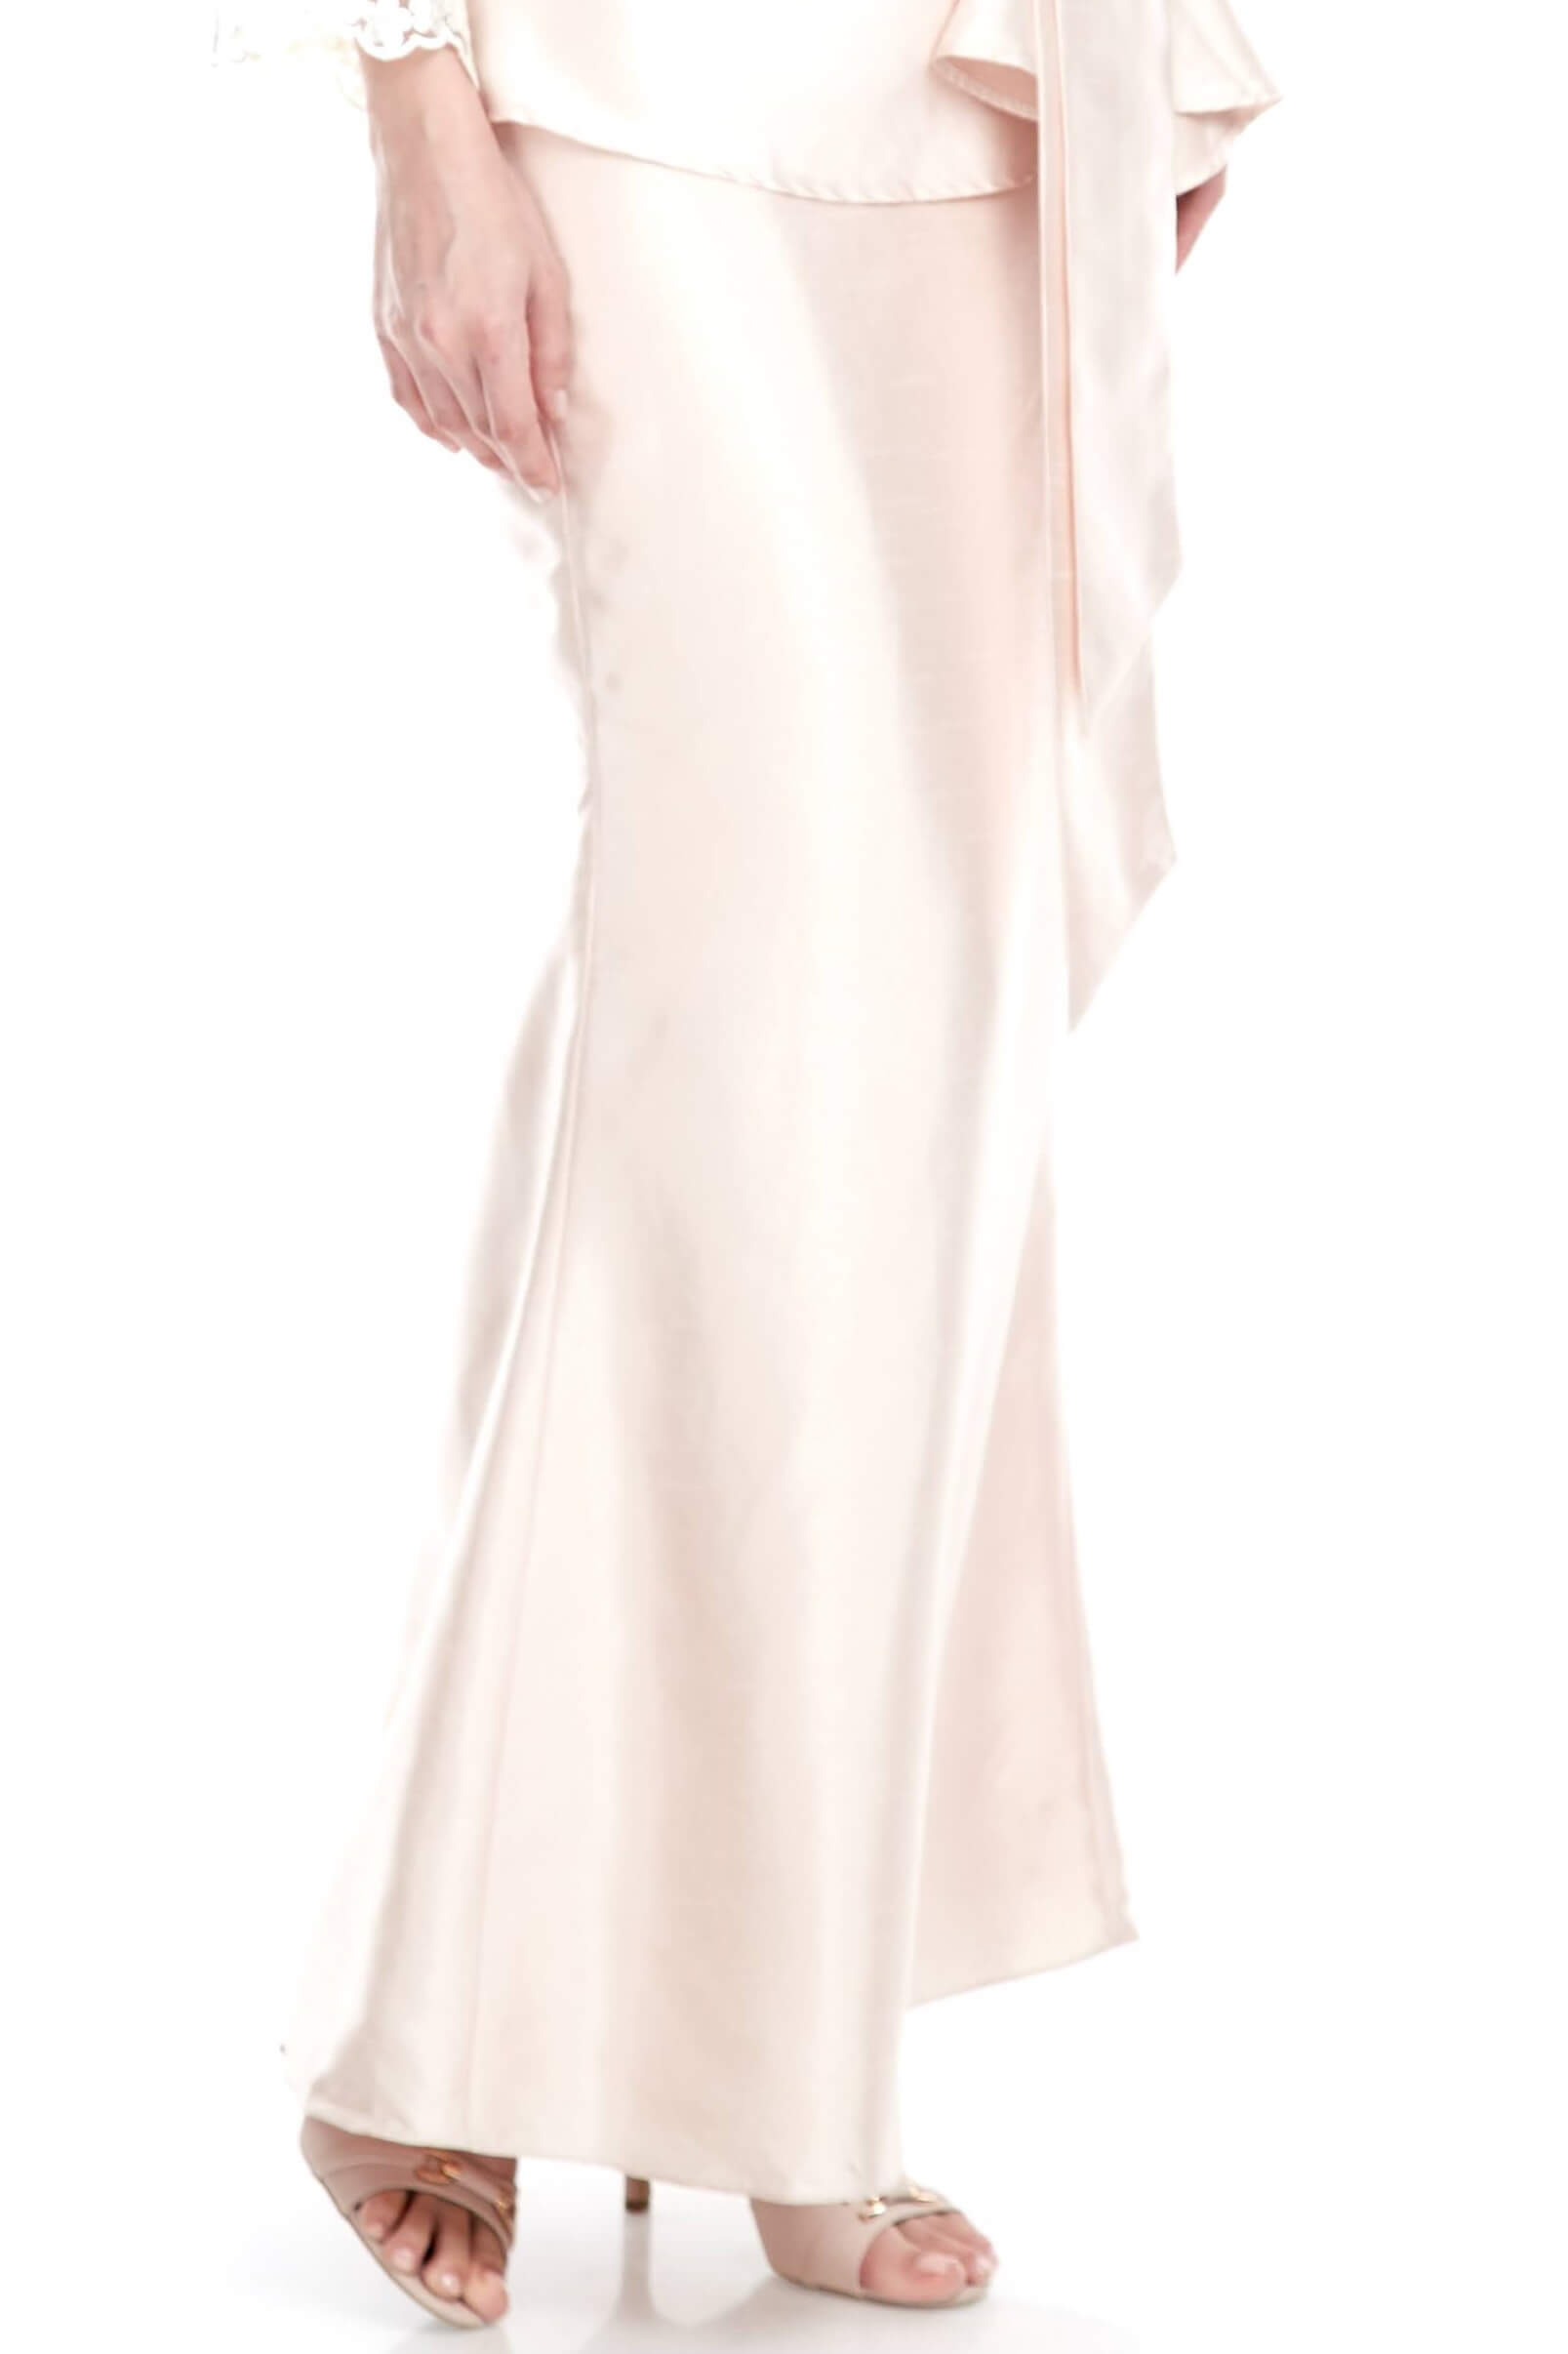 Peach Mermaid Skirt (6)